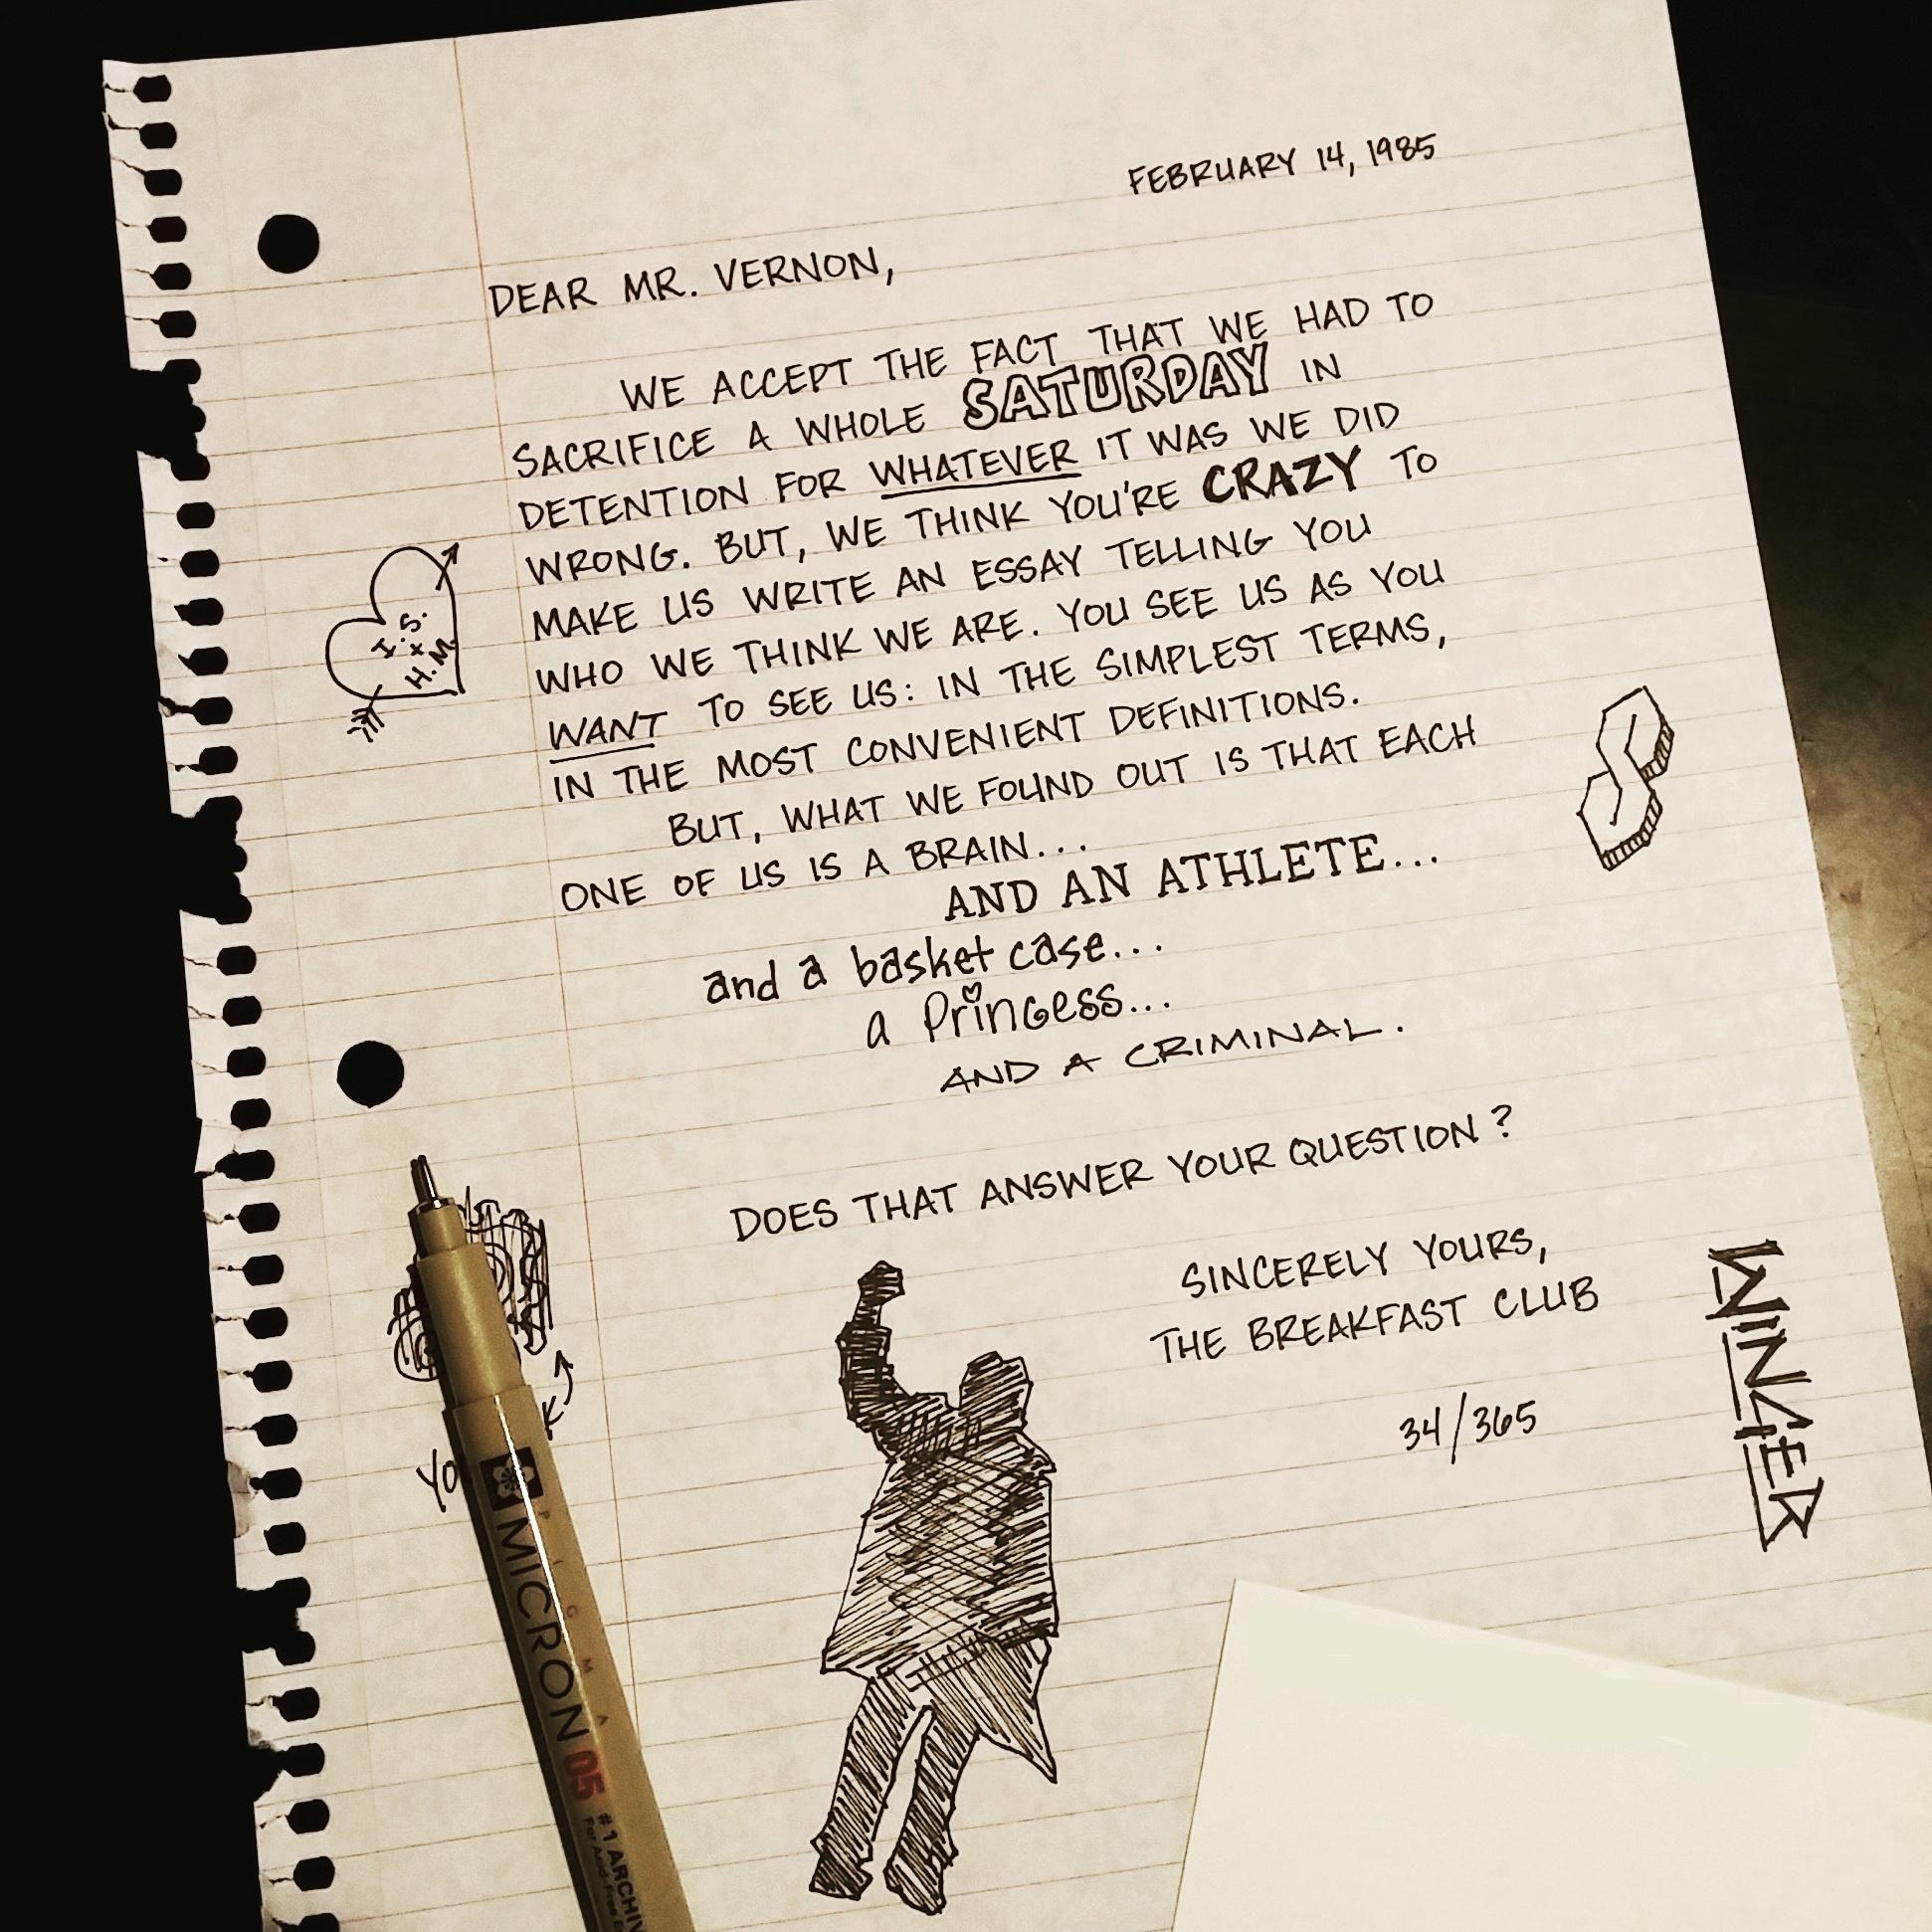 009 The Breakfast Club Essay Breathtaking Scene Introduction Analysis Full